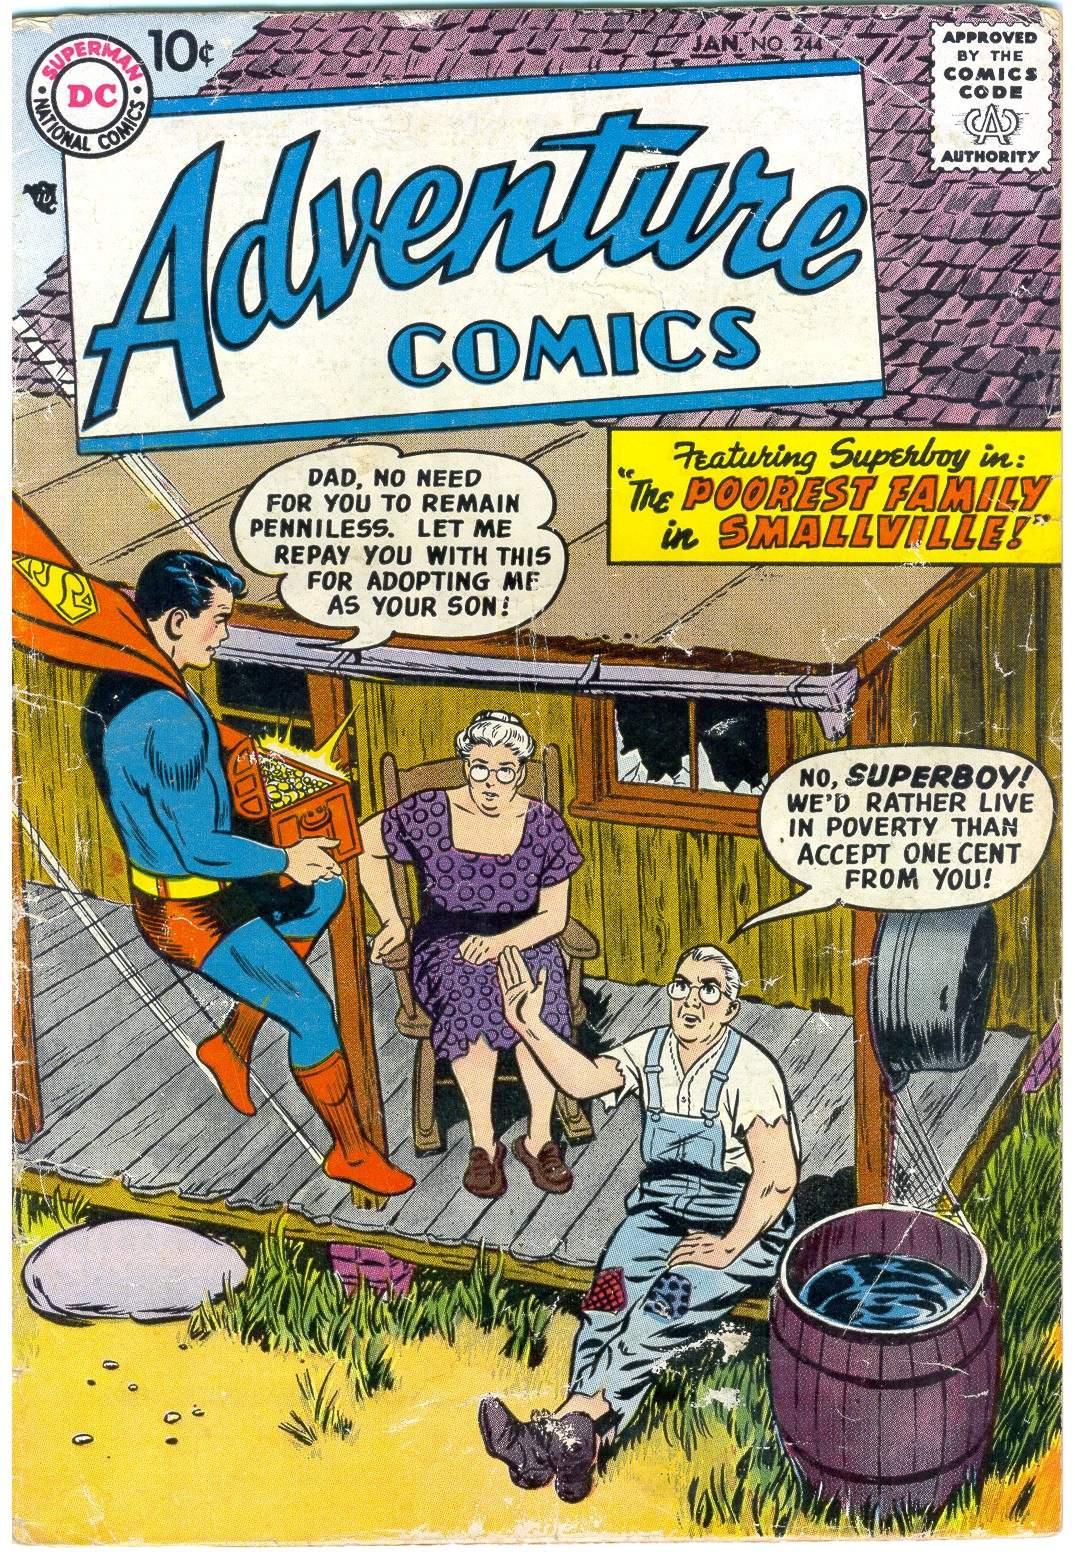 Read online Adventure Comics (1938) comic -  Issue #244 - 1